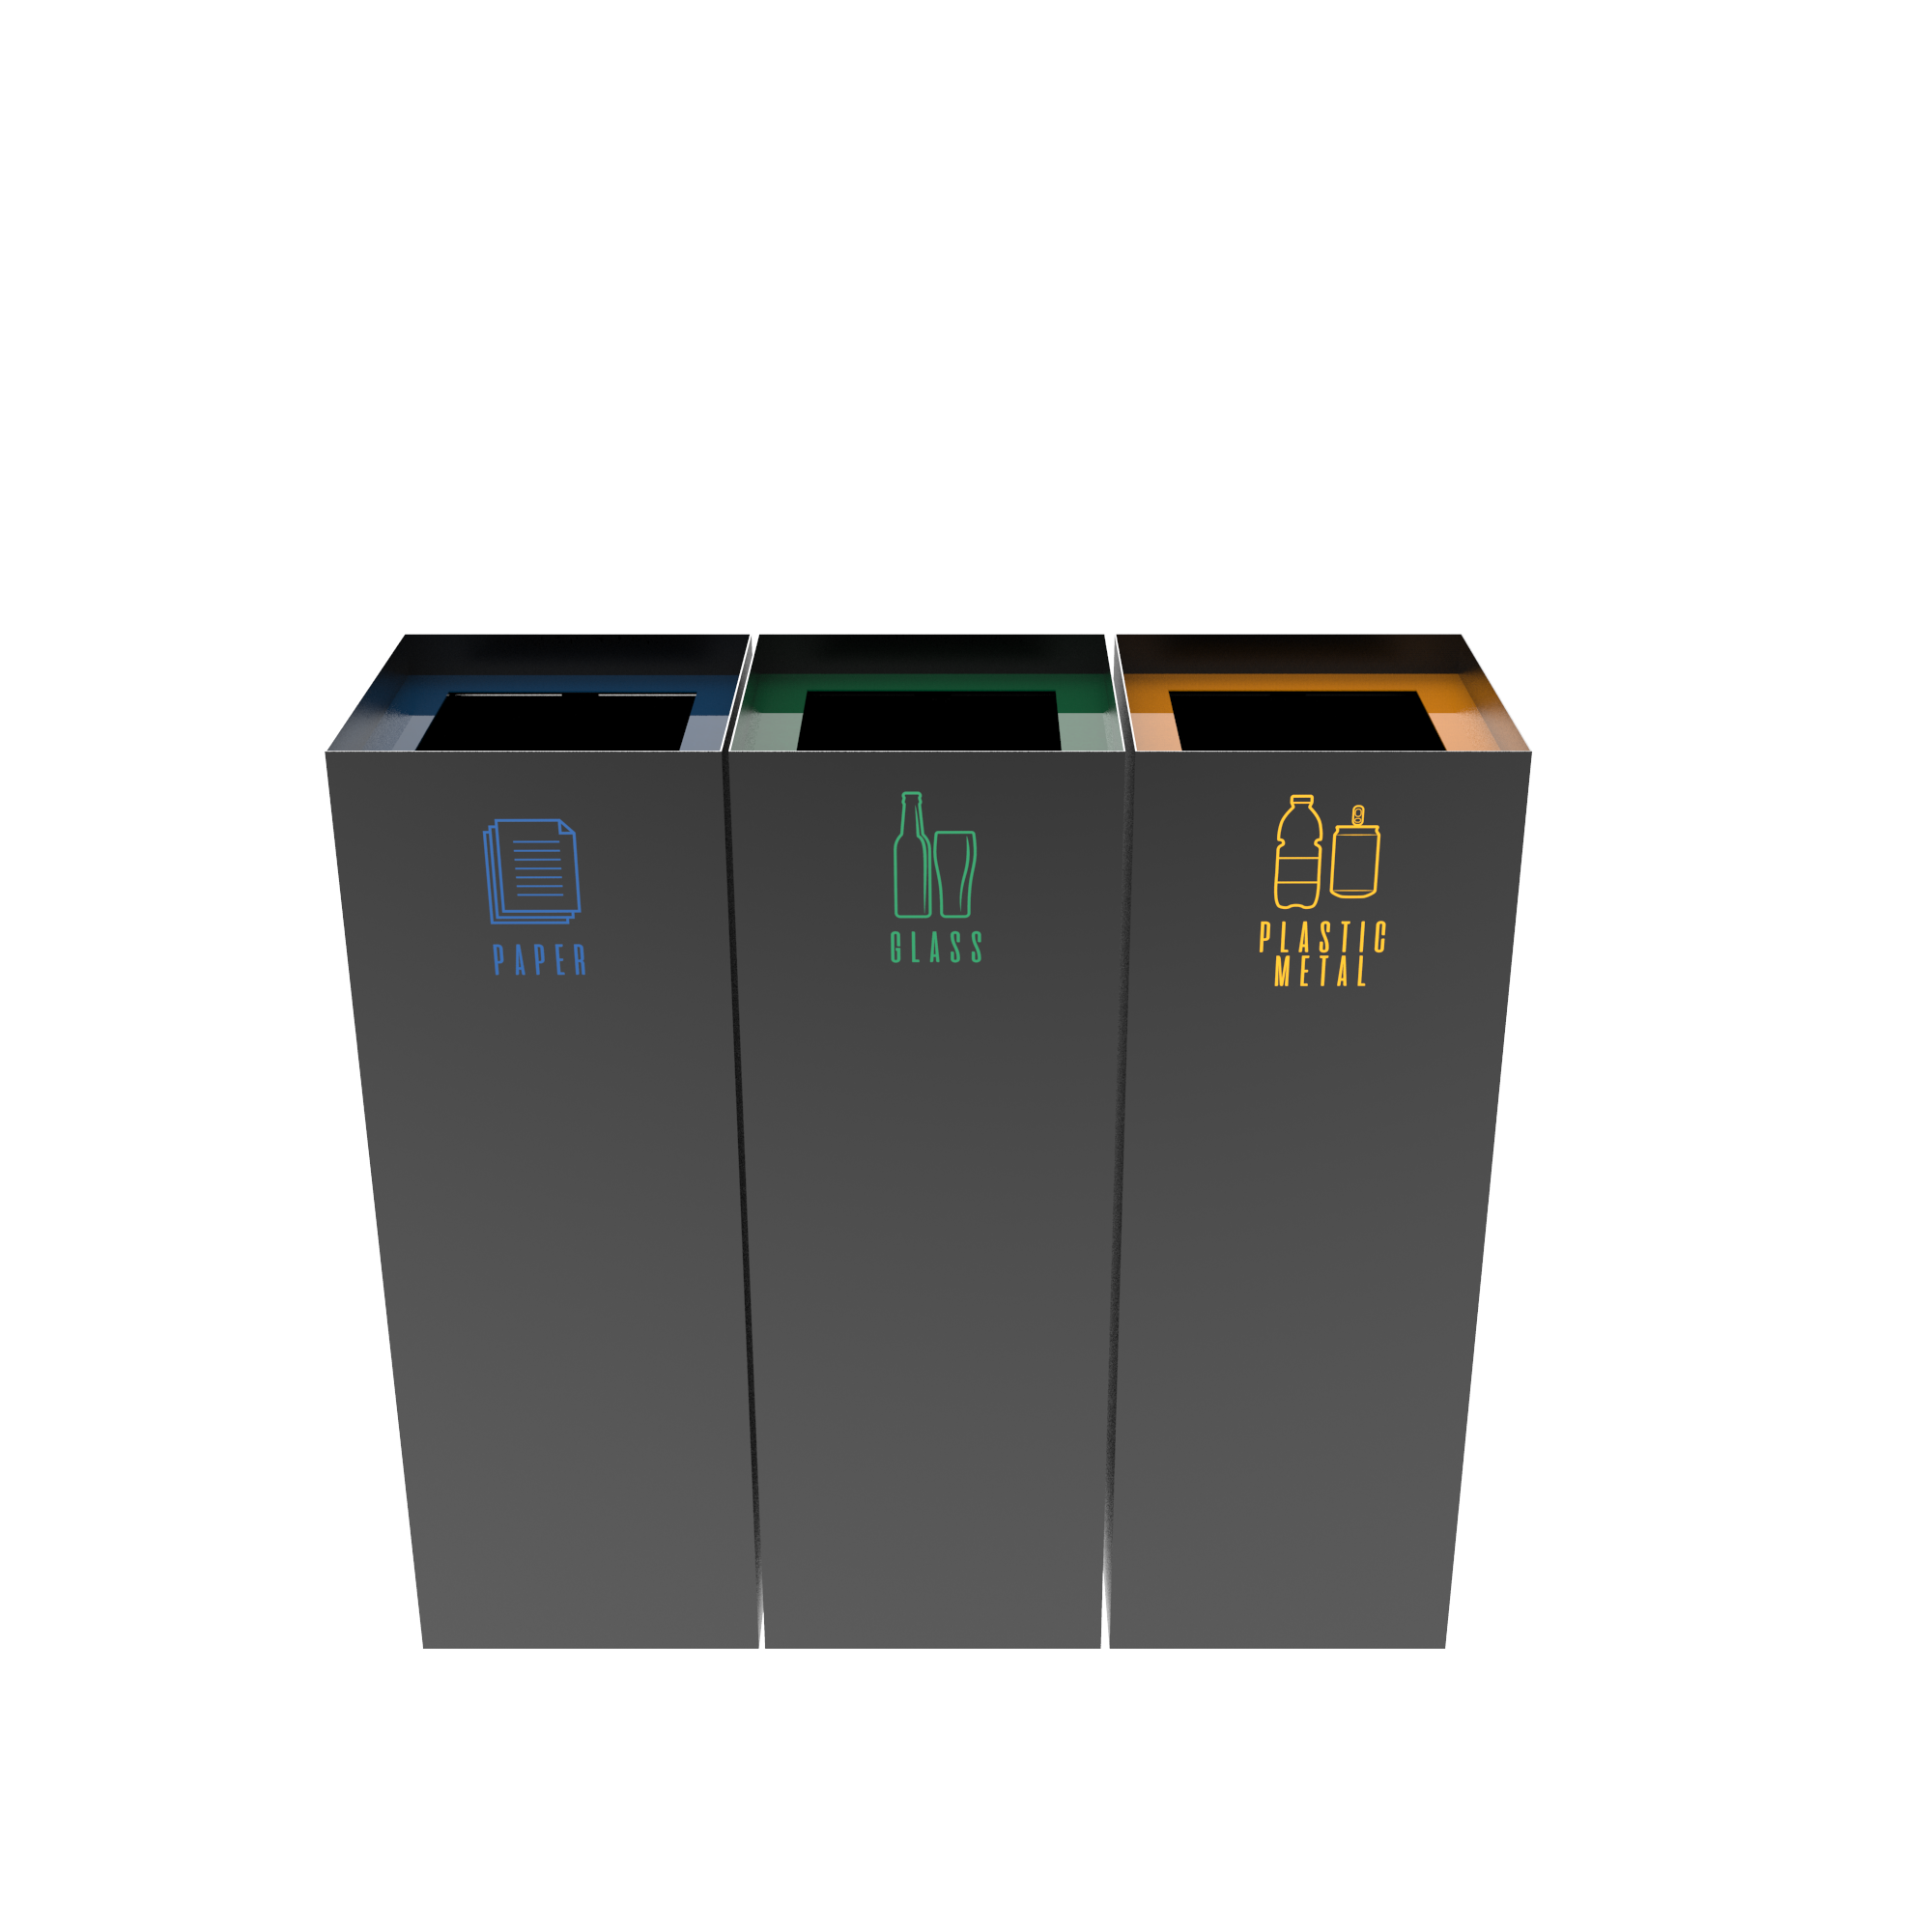 Medele Pc Modern Urban Recycle Bins In Sheet Metal Binsignia